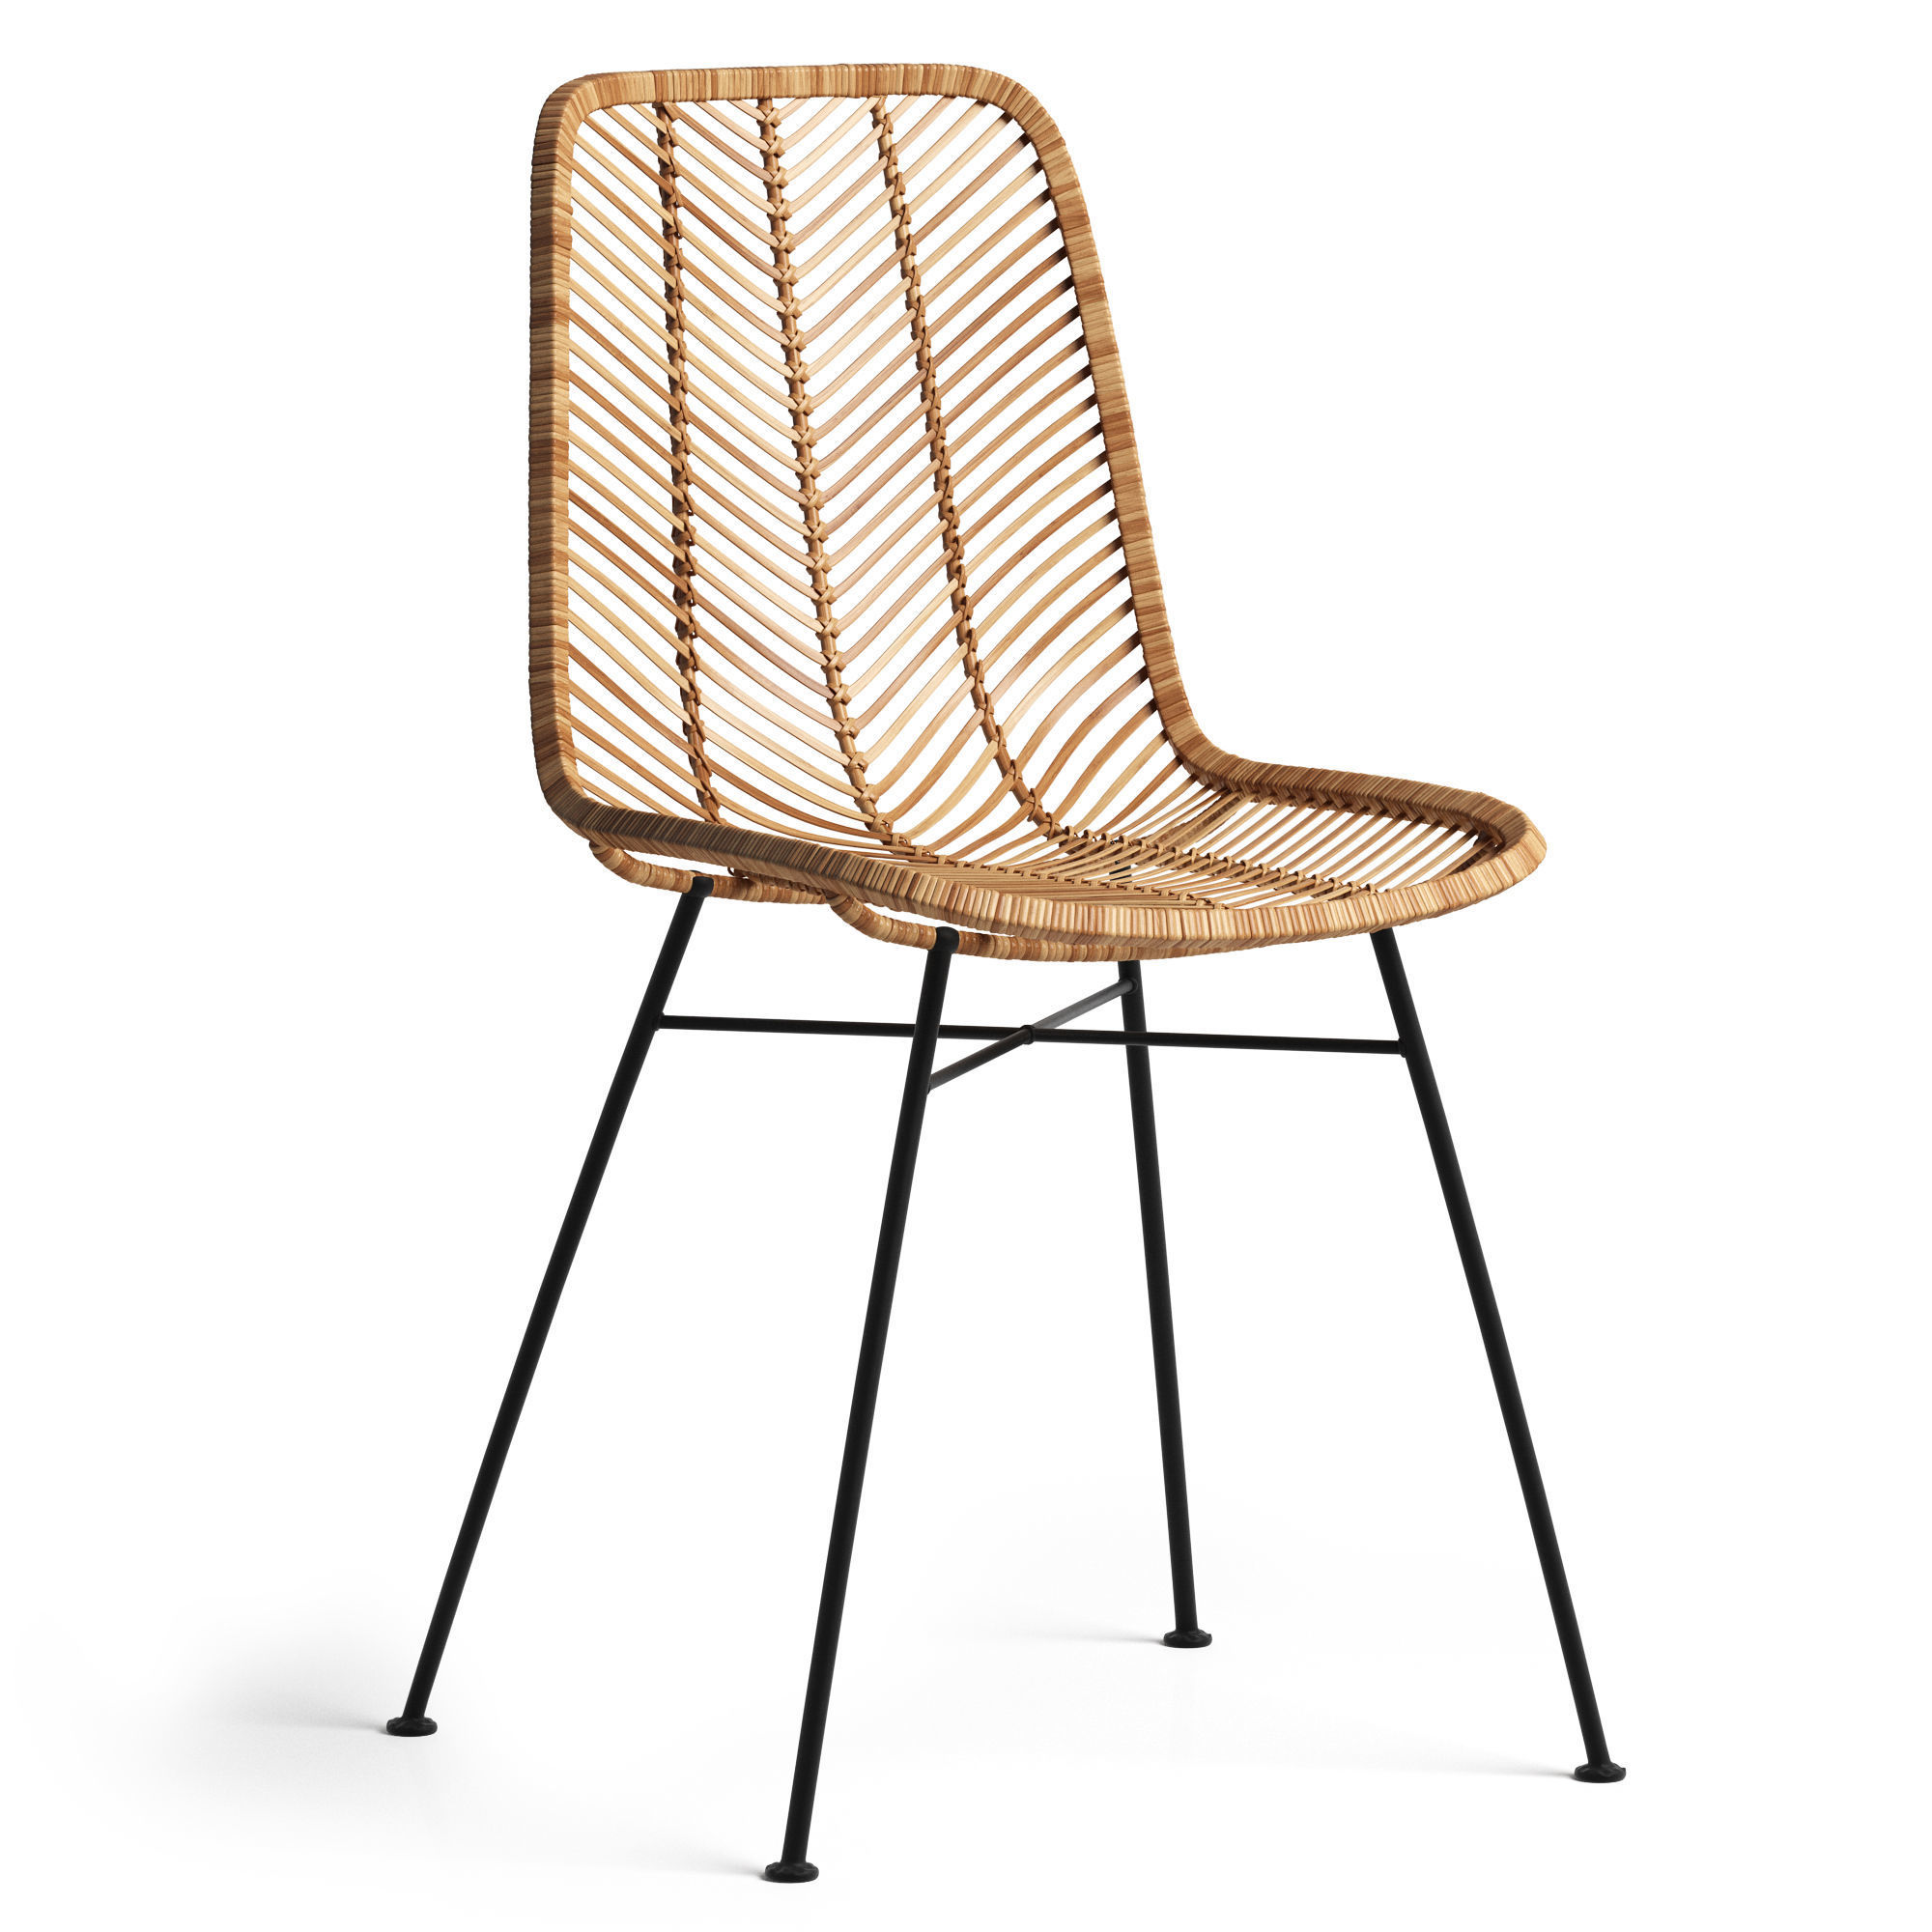 Rattan chair Lena - Bloomingville